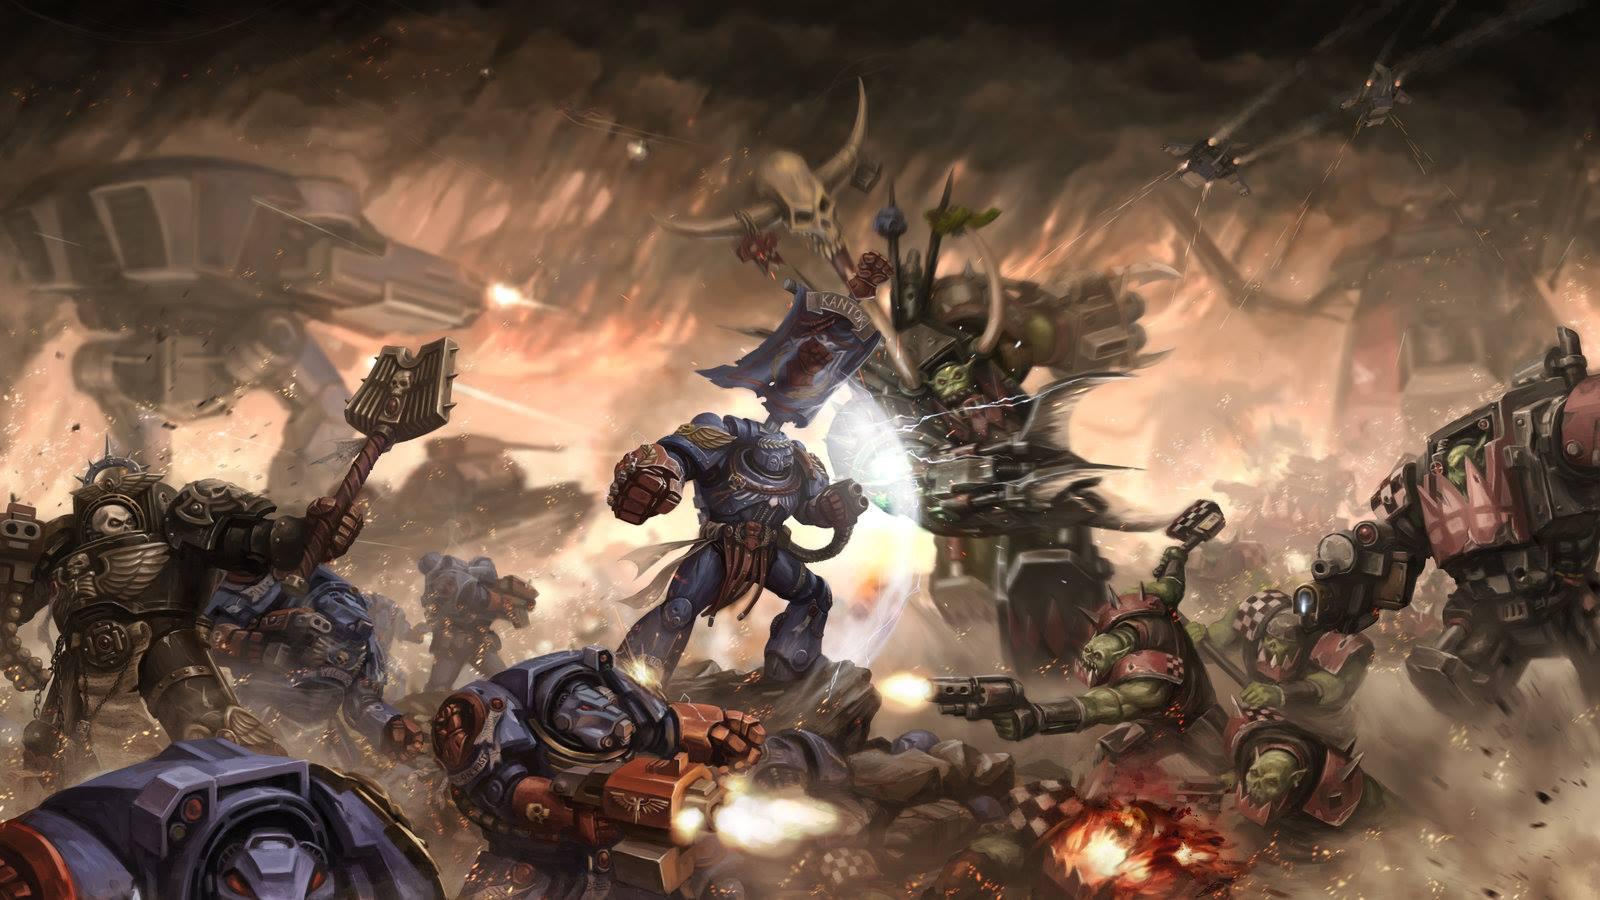 Warhammer ORC Wallpaper 39 Warhammer ORC High Resolution 1600x900